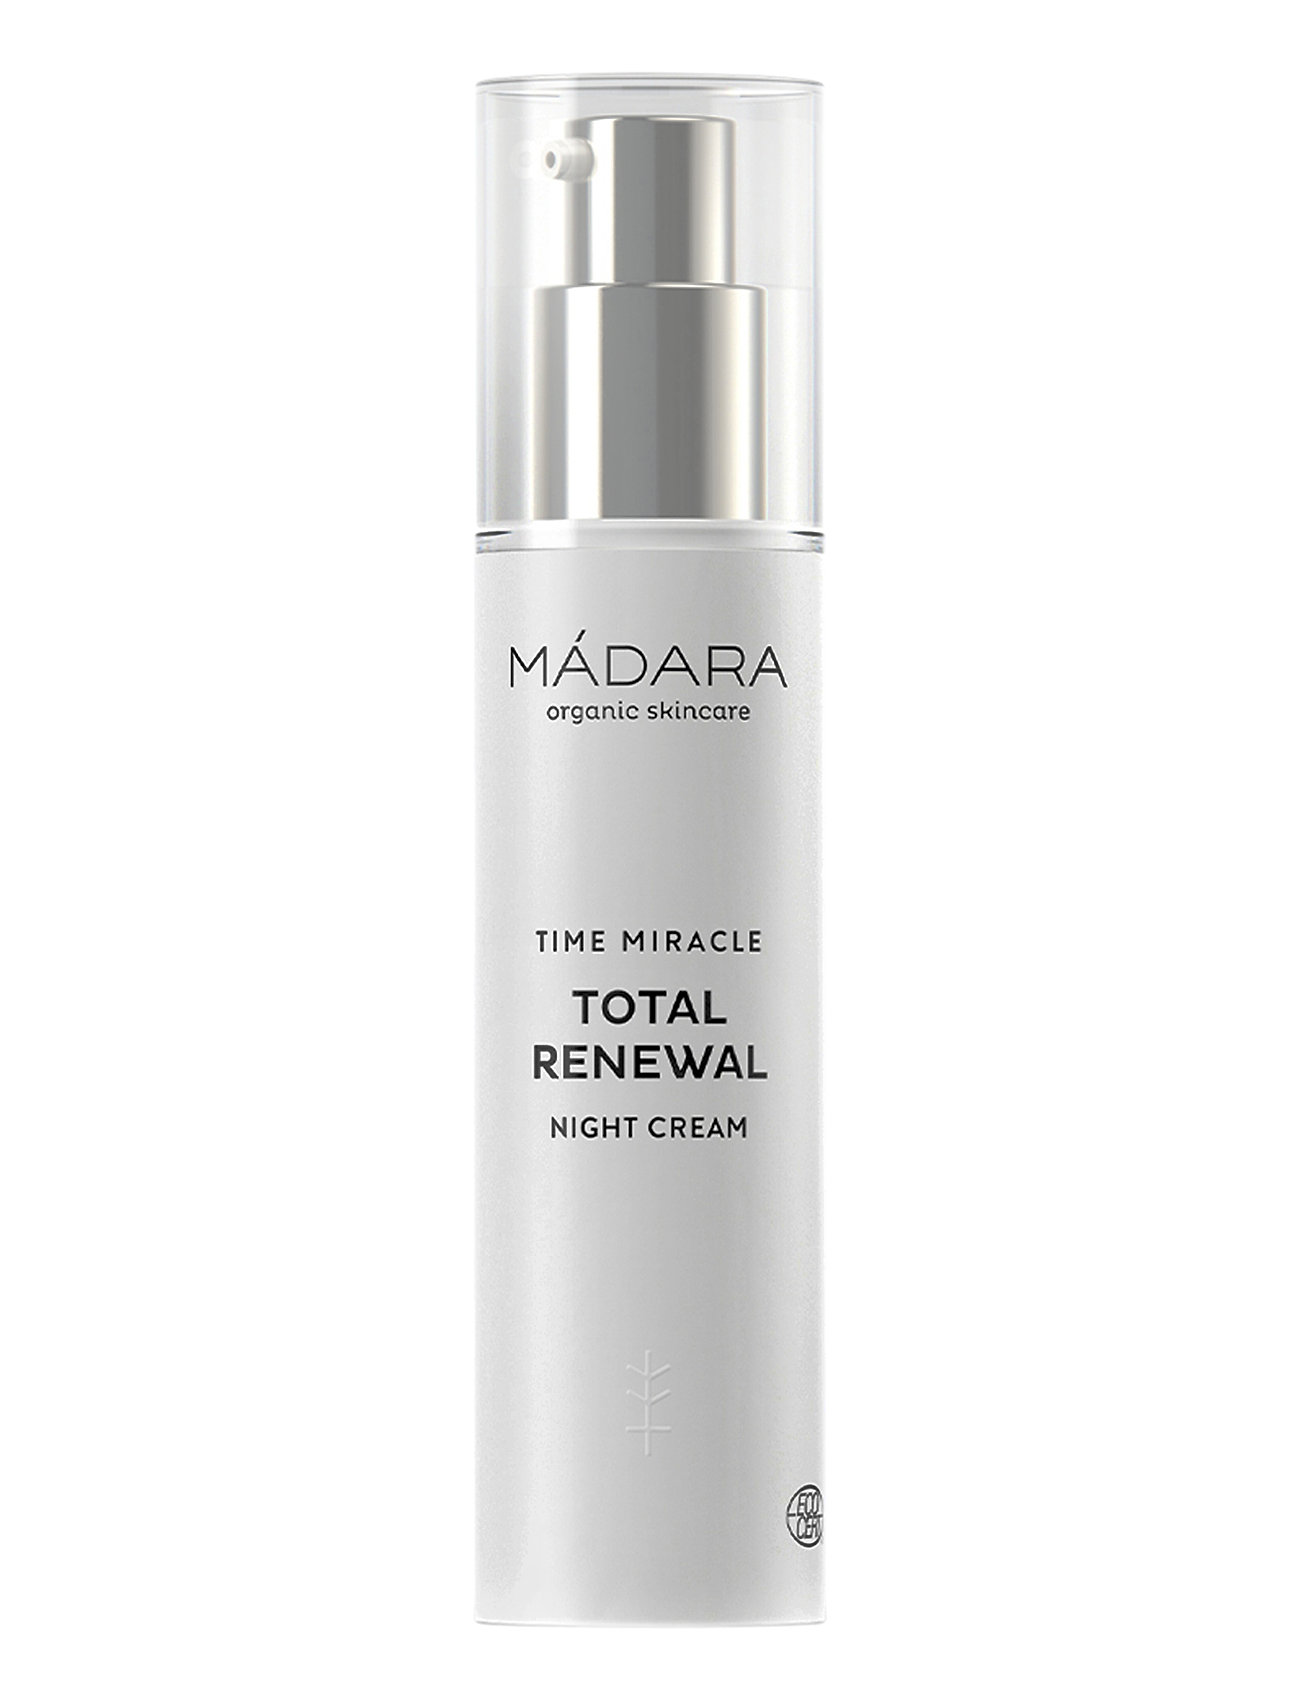 Image of Total Renewal Night Cream, 50 Ml Beauty WOMEN Skin Care Face Moisturizers Night Cream Nude MÁDARA (3217759355)